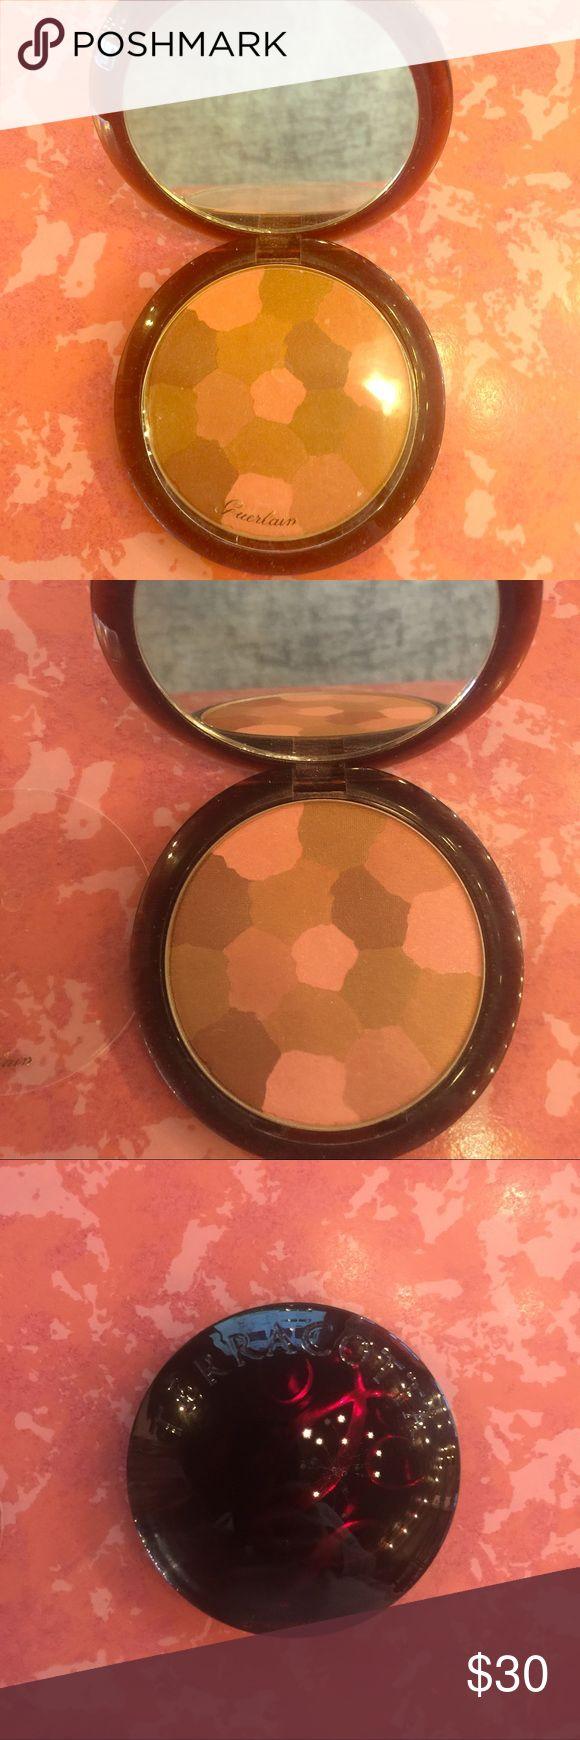 Guerlain bronzing powder Terracotta light sheer bronzing